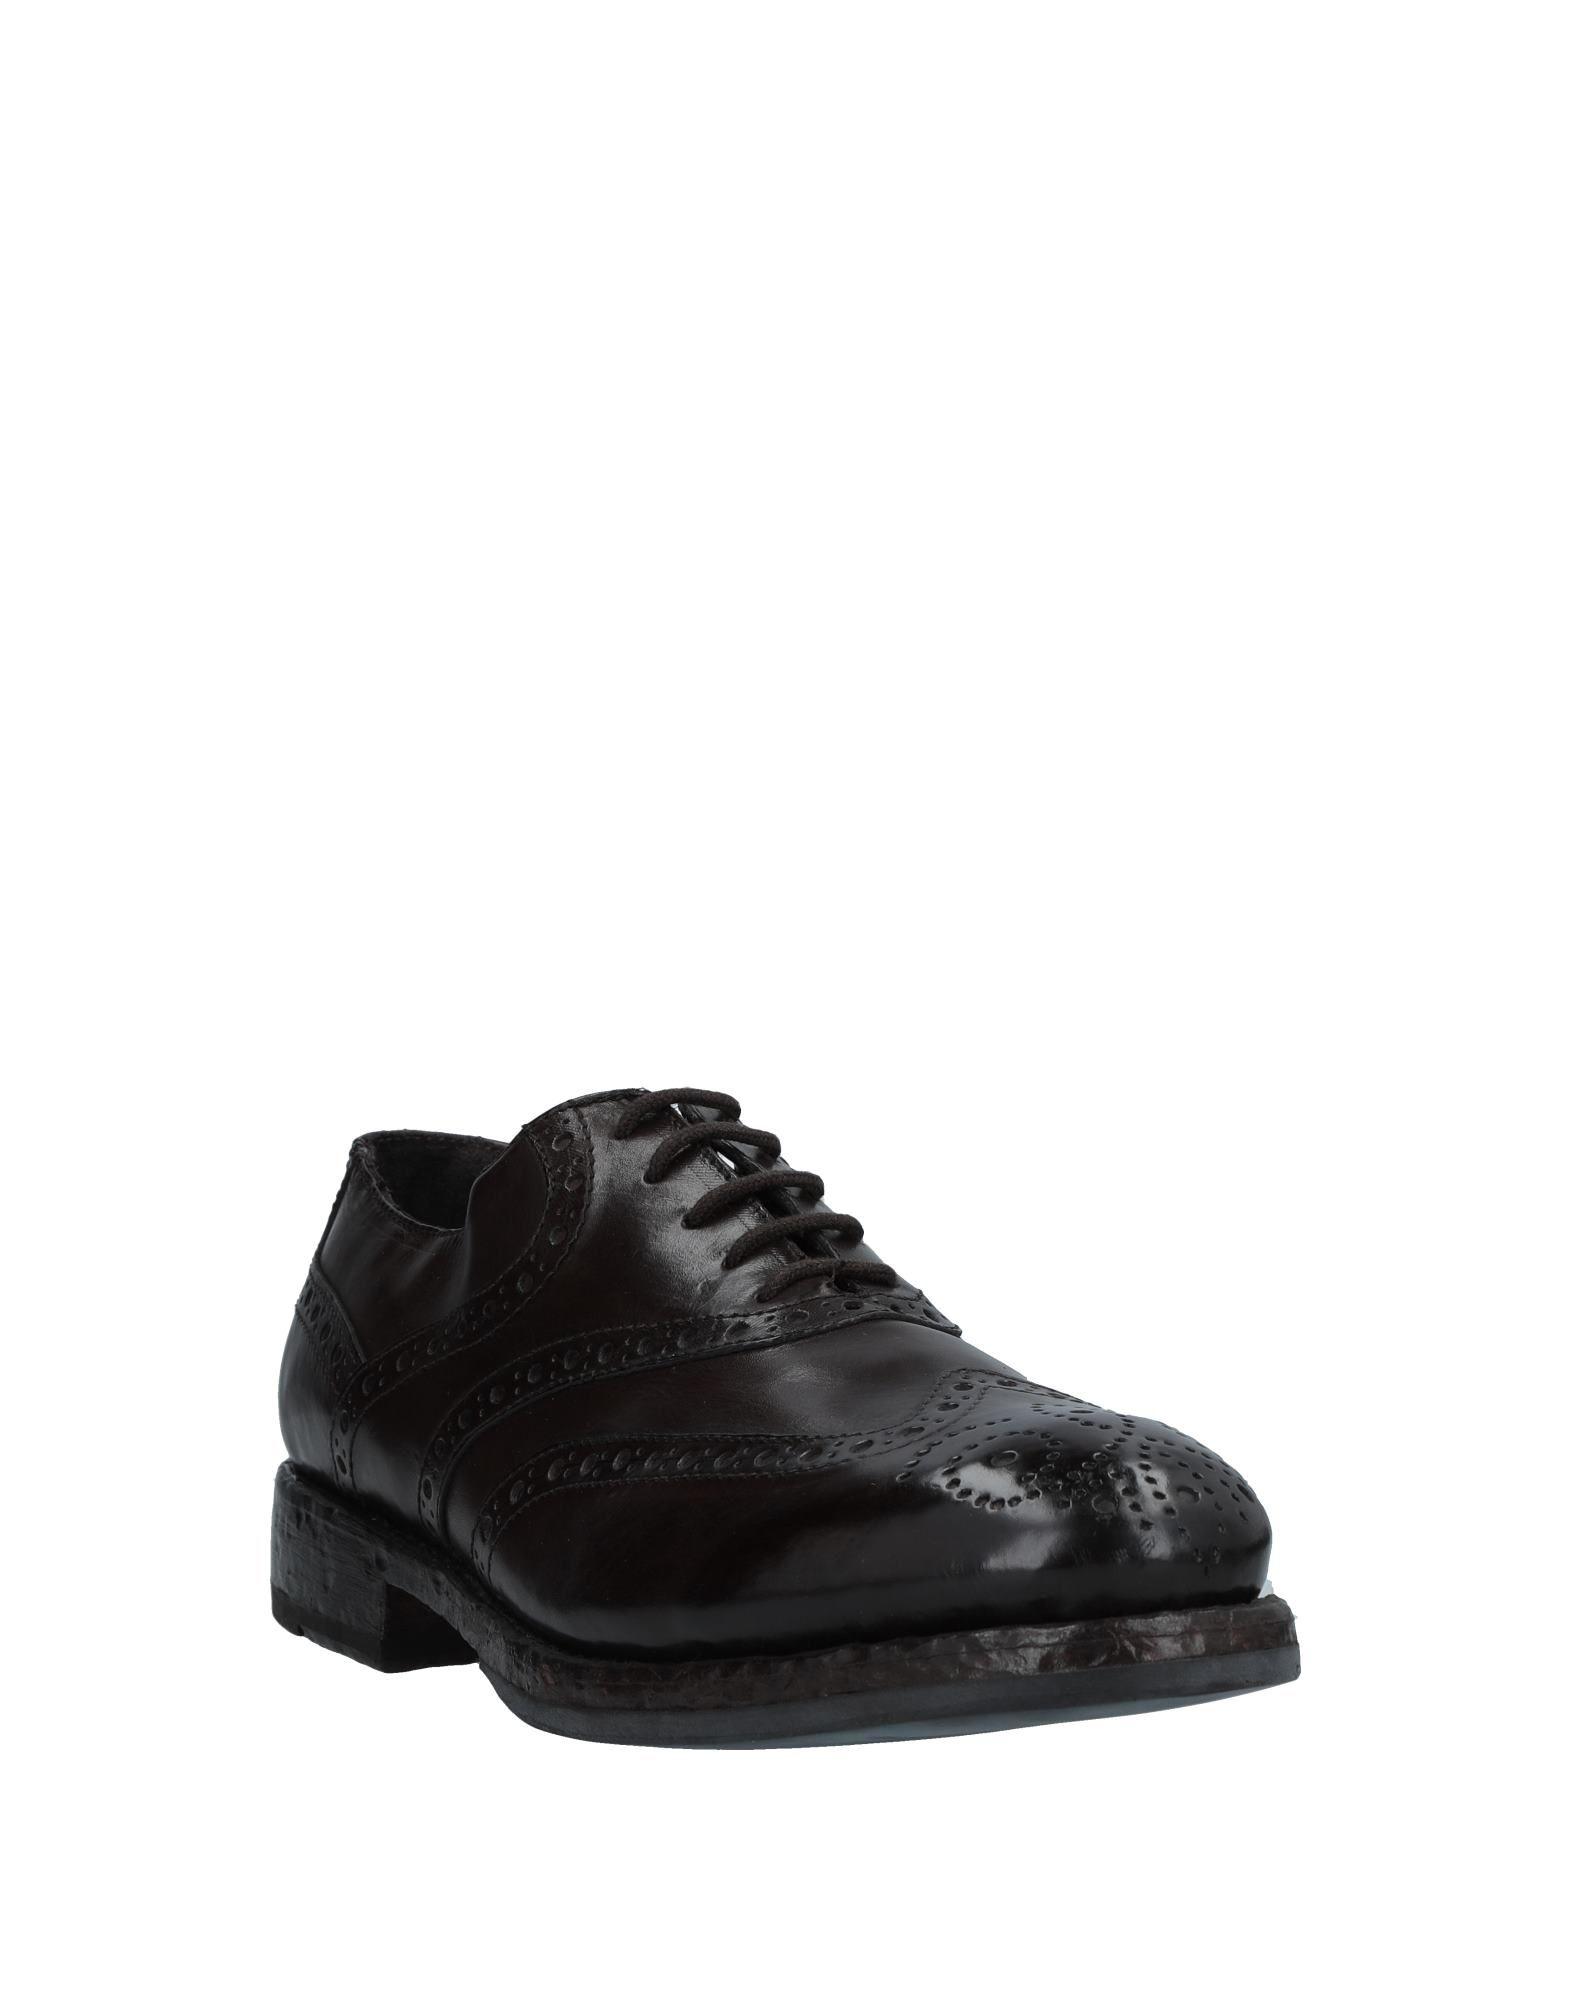 Rabatt echte Schnürschuhe Schuhe Open Closed  Shoes Schnürschuhe echte Herren  11012812BG 9368de